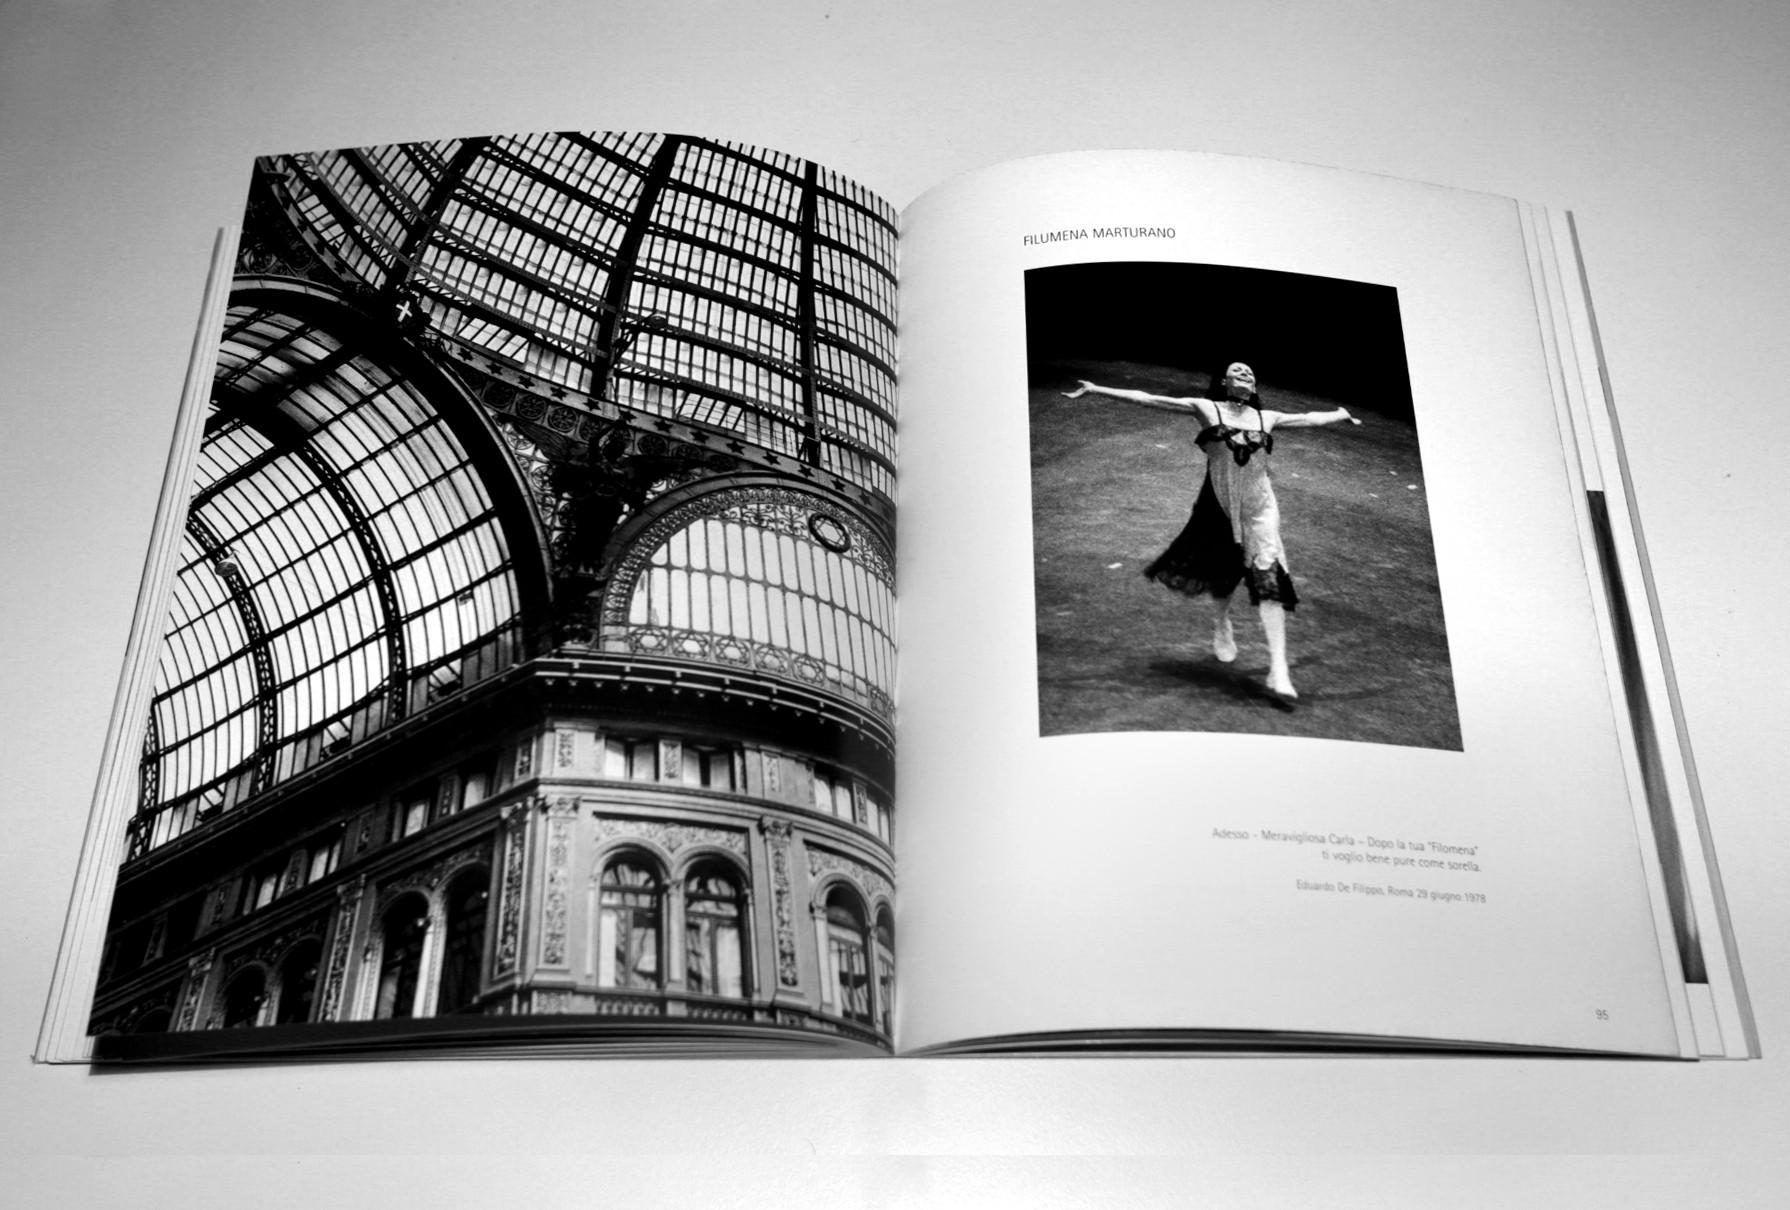 'Filumena Marturano' subject by Eduardo De Filippo, Teatro San Carlo, Napoli, Italy, 2000